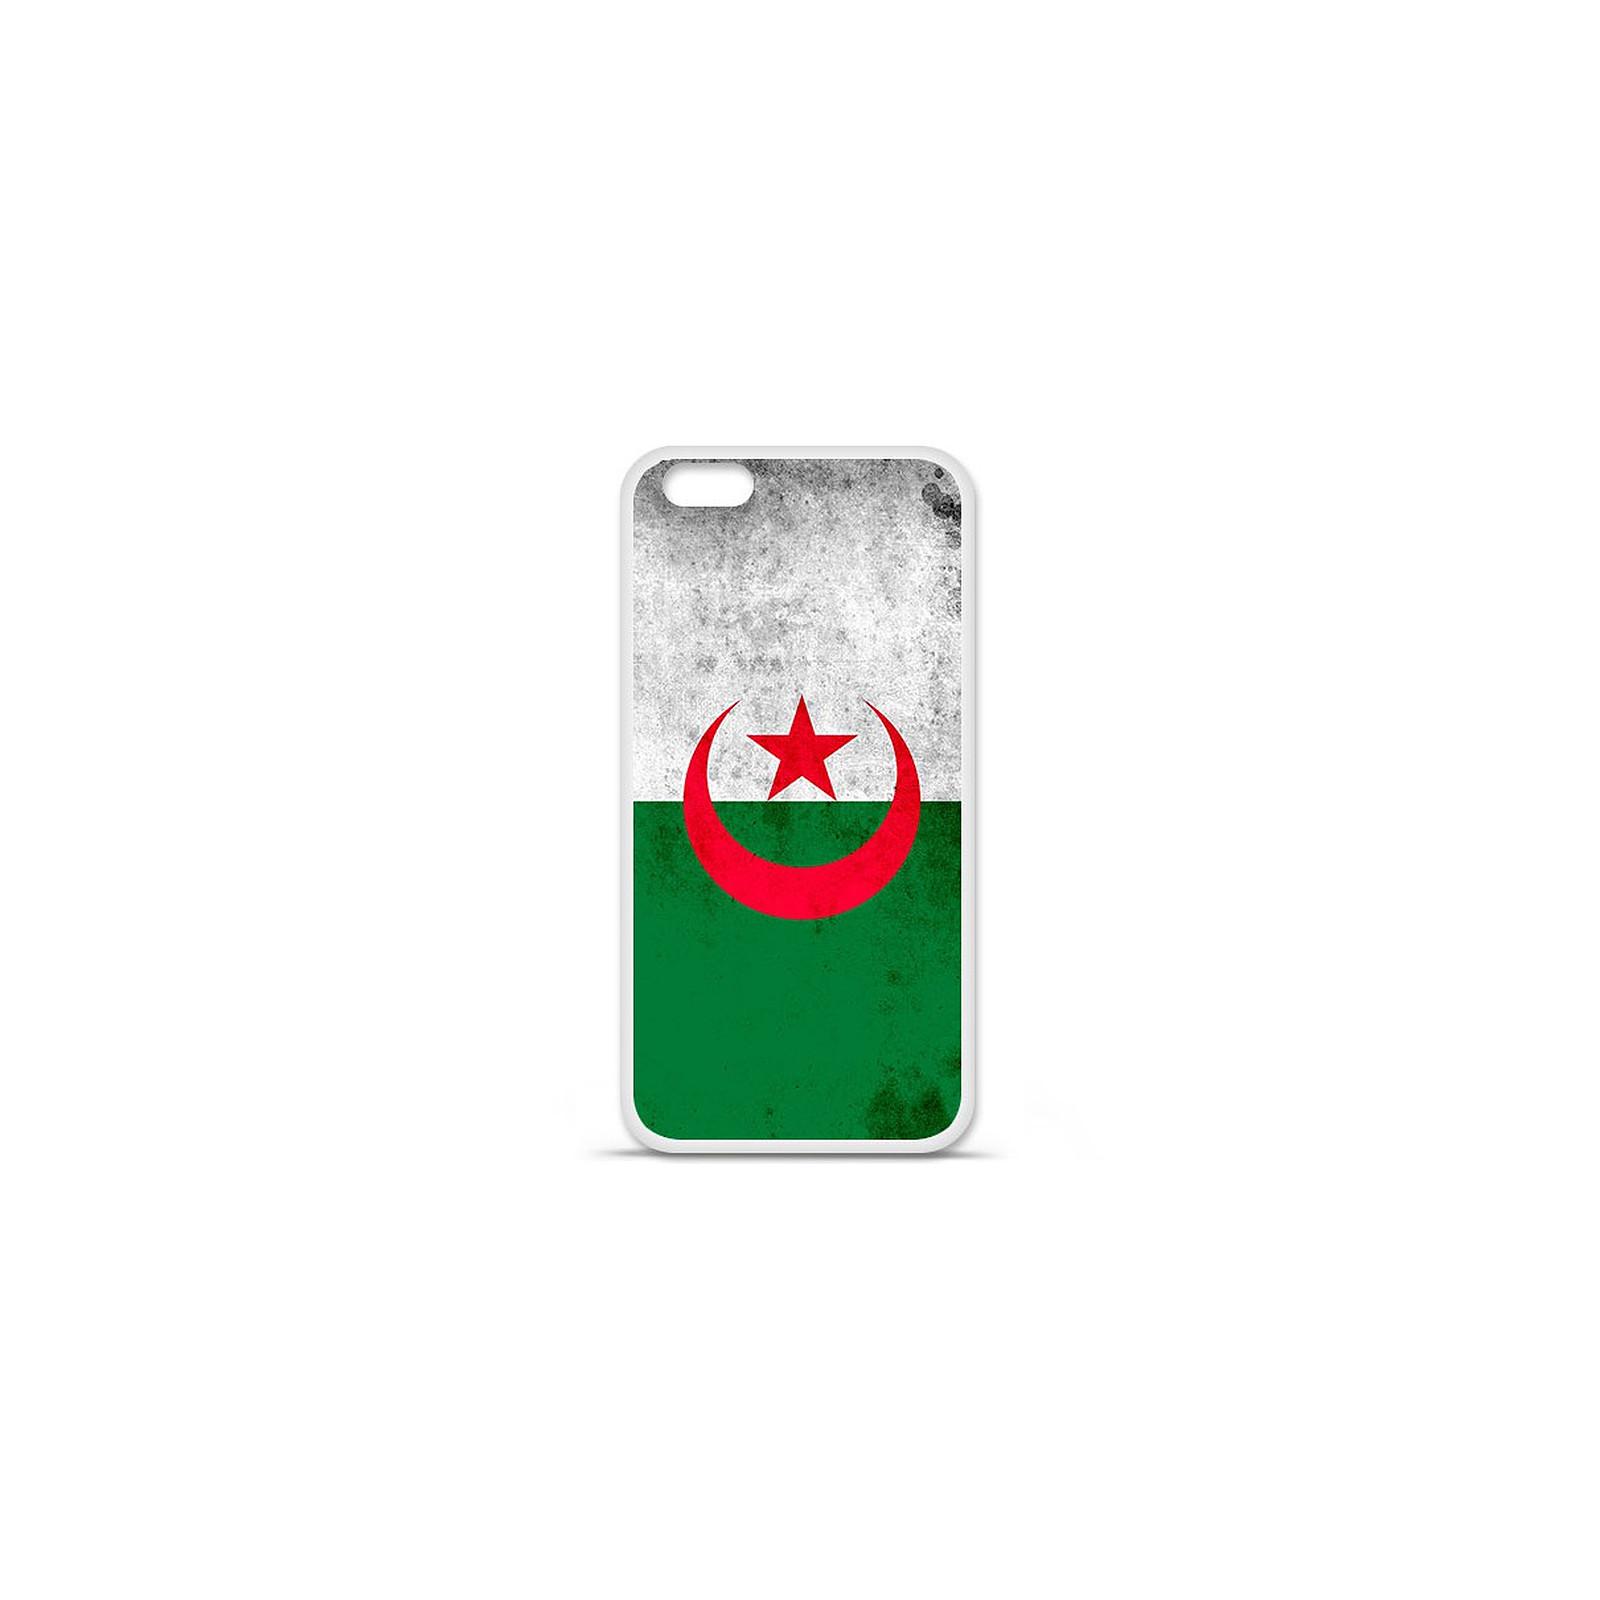 1001 Coques Coque silicone gel Apple IPhone 7 Plus motif Drapeau Algérie